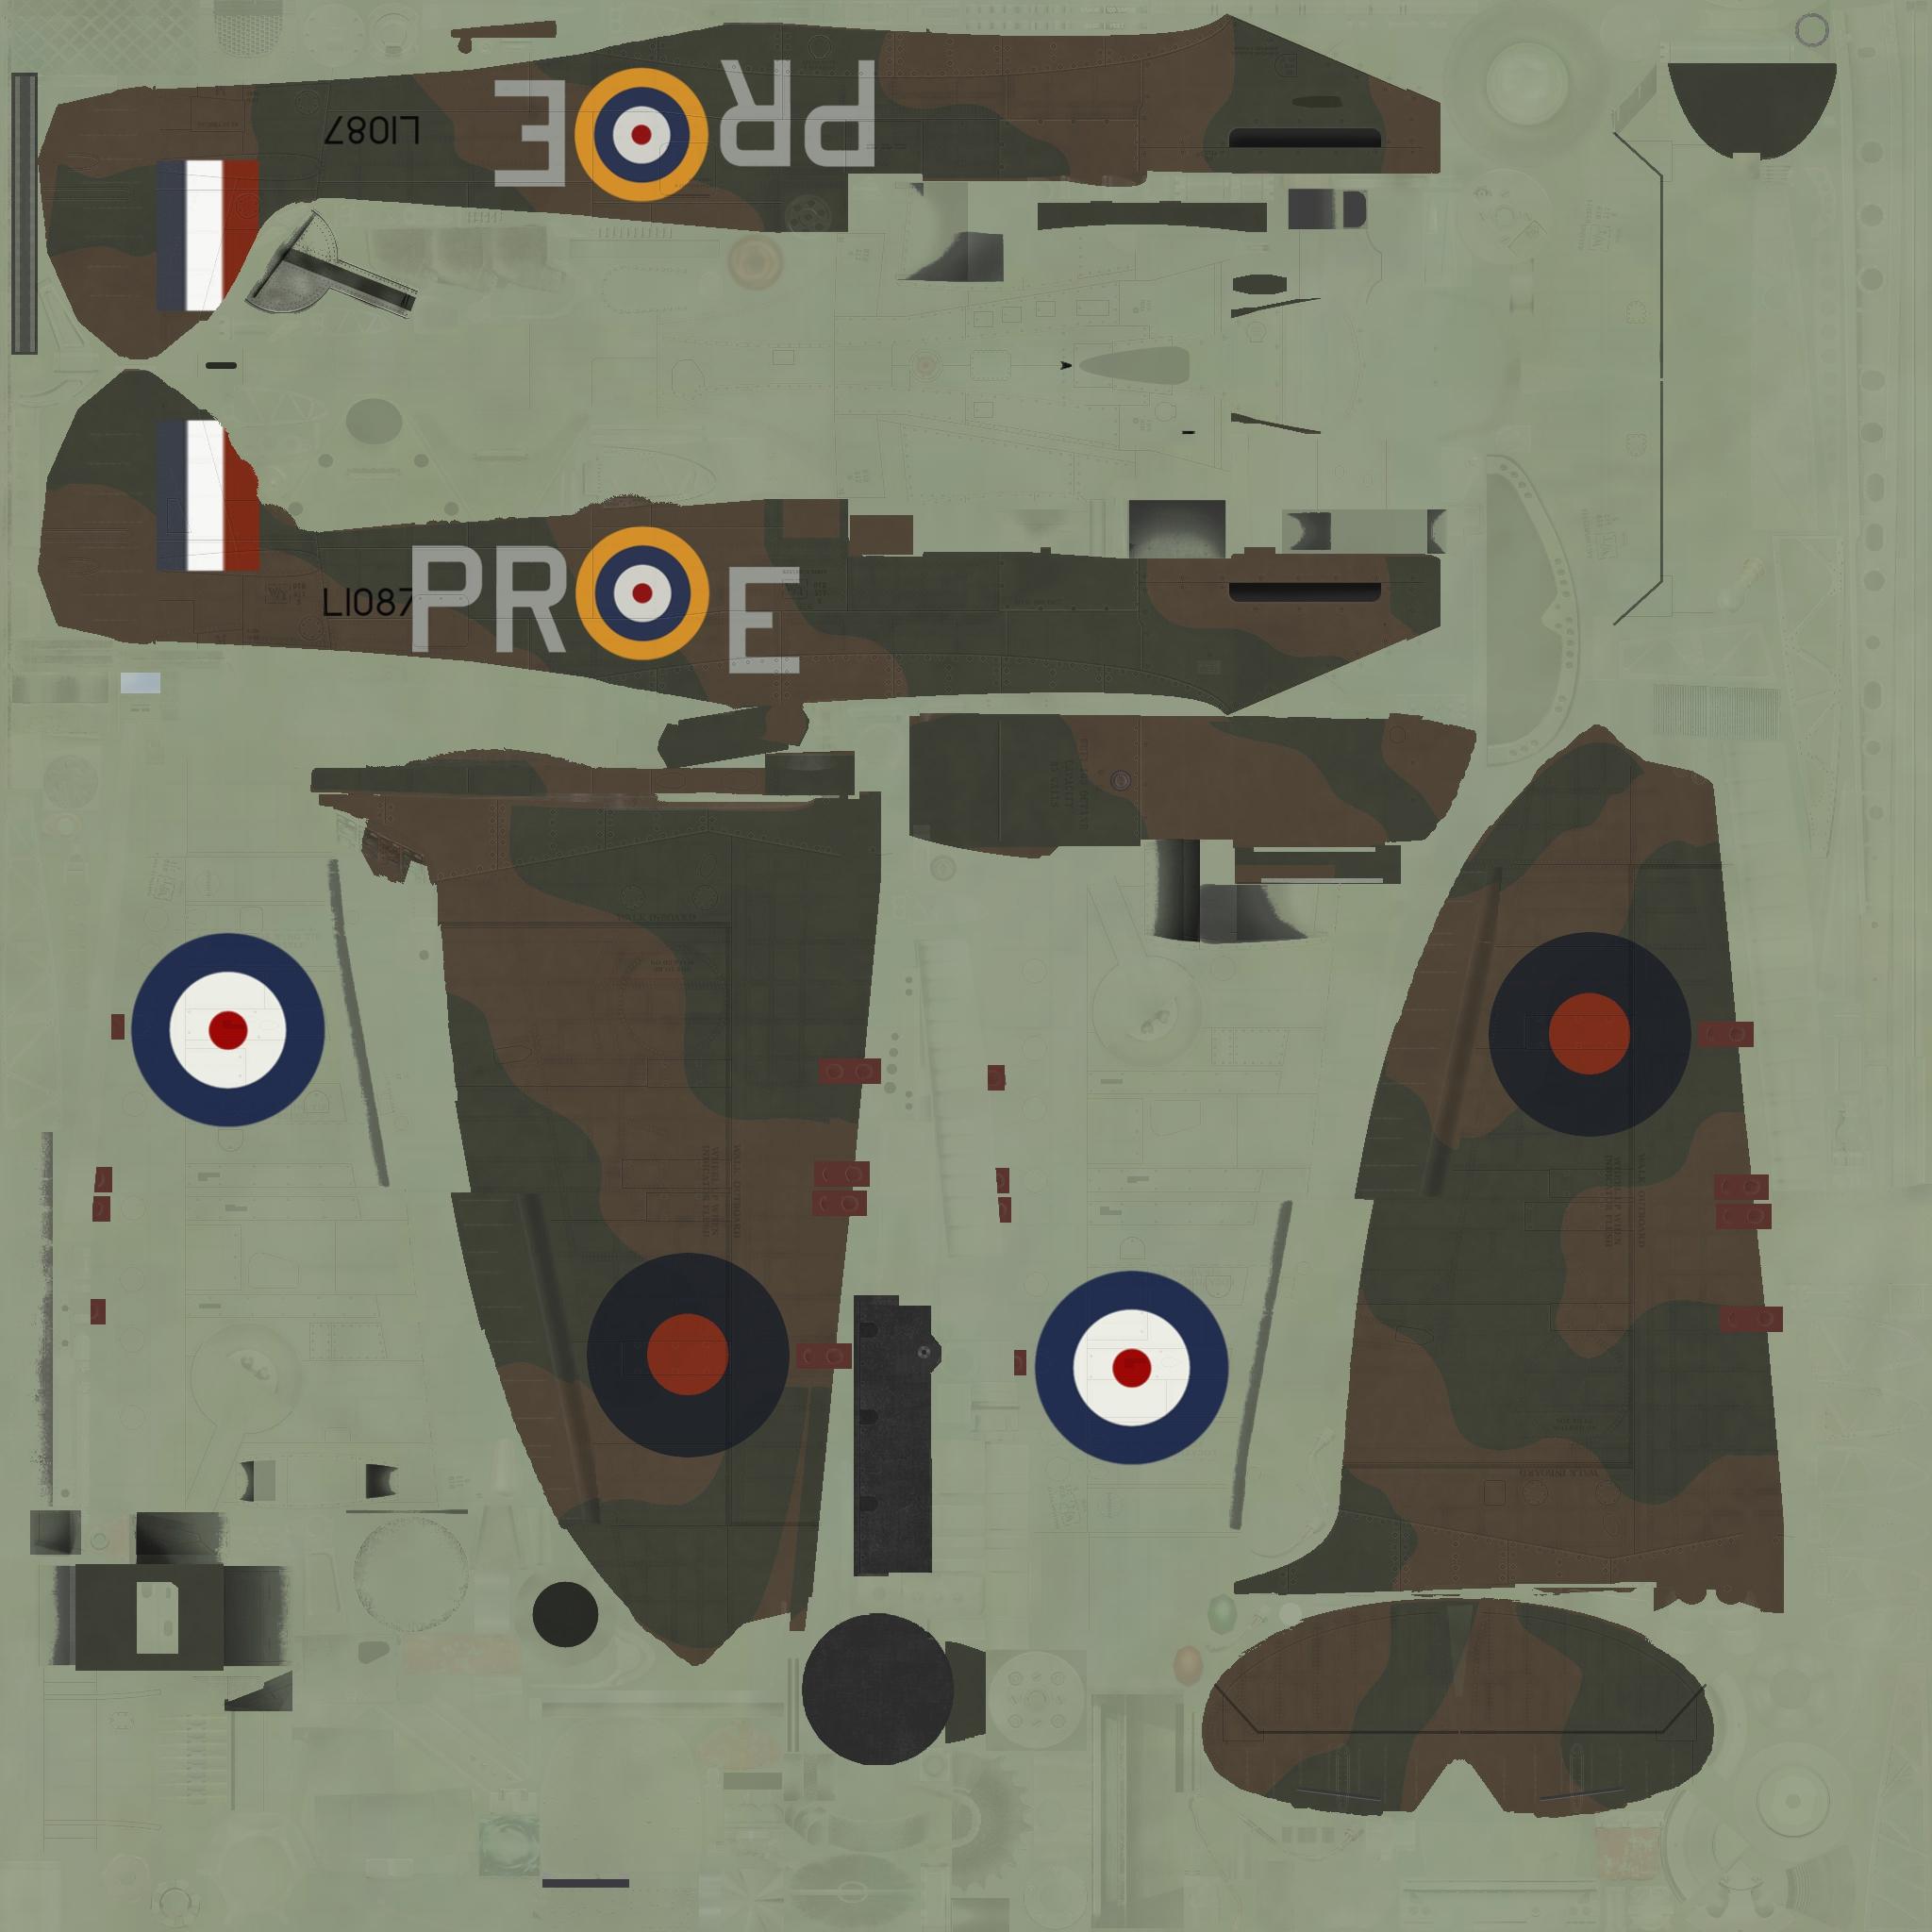 COD C6 MkI RAF 609Sqn PRE L1087 Middle Wallop 1940